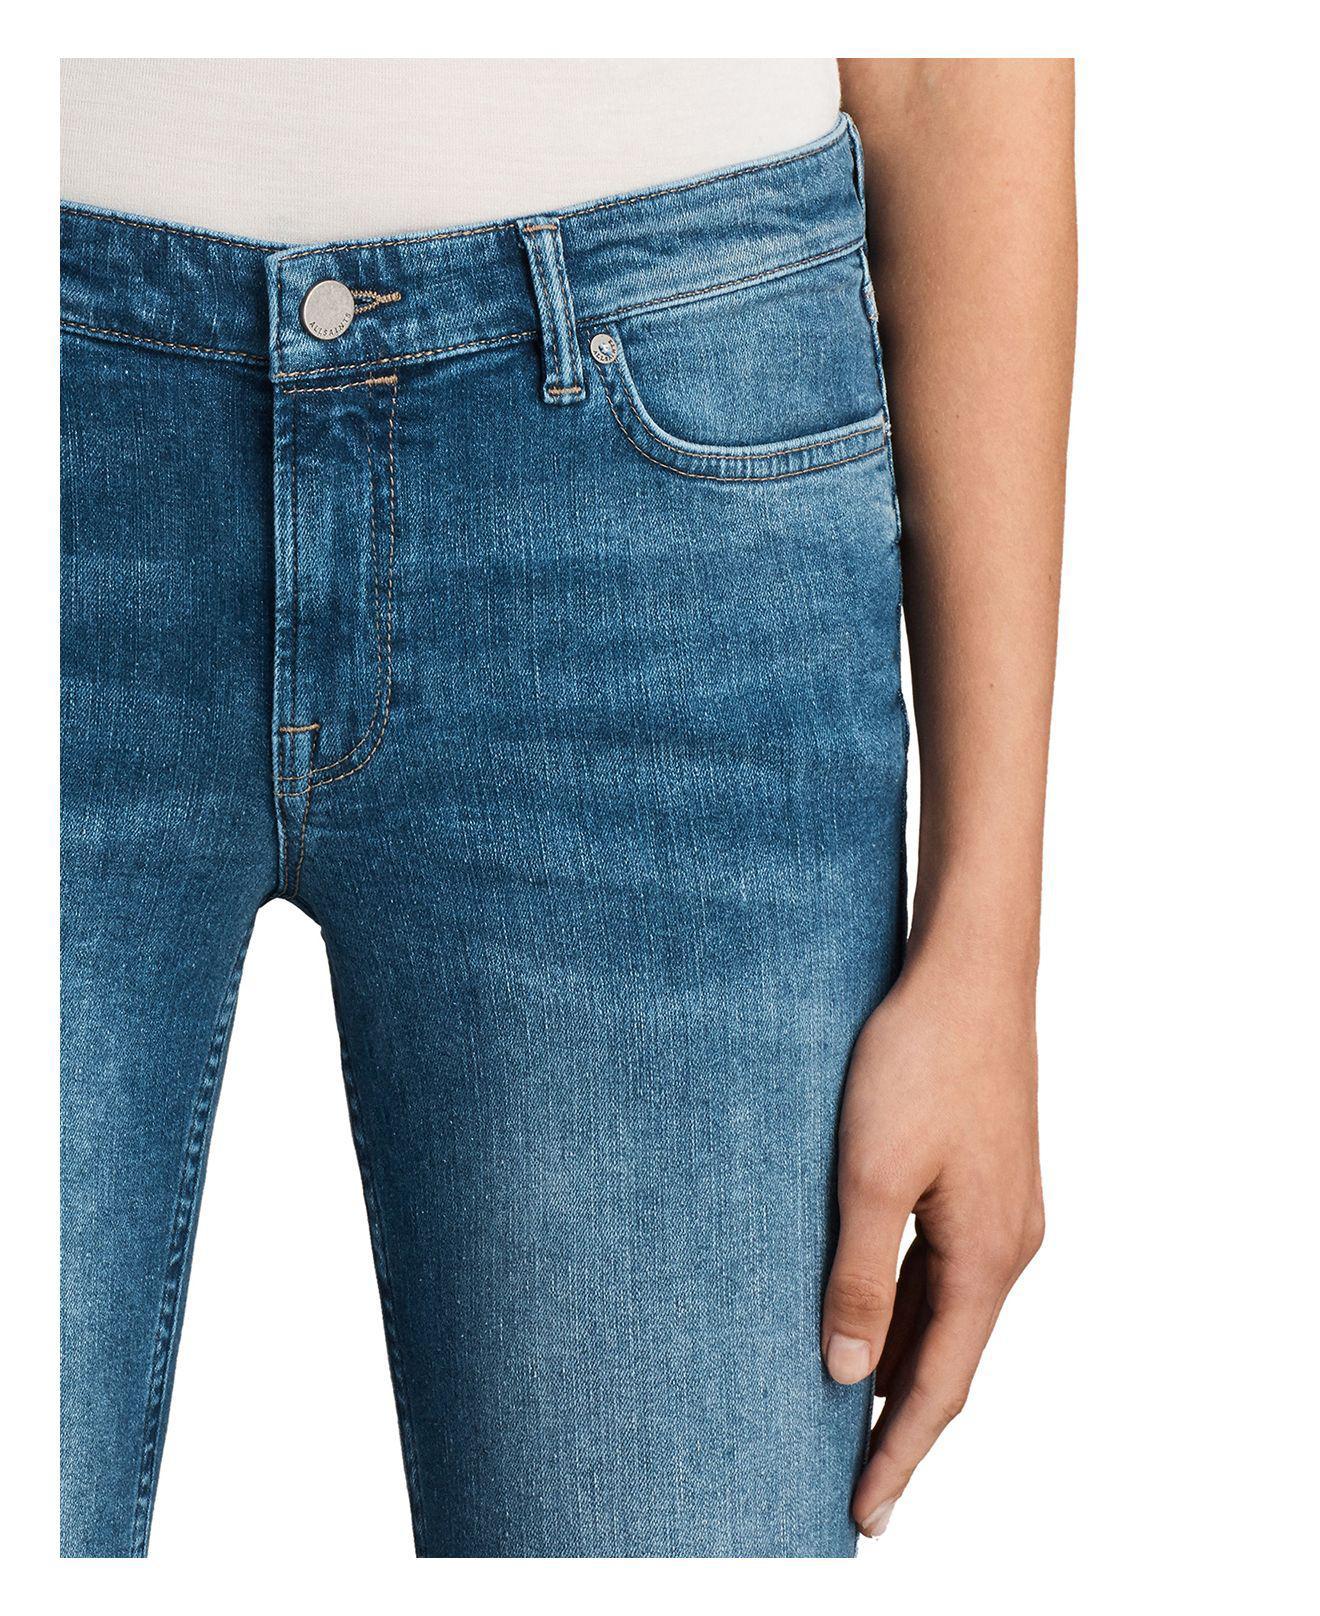 AllSaints Denim Mast Twisted Jeans In Indigo Blue